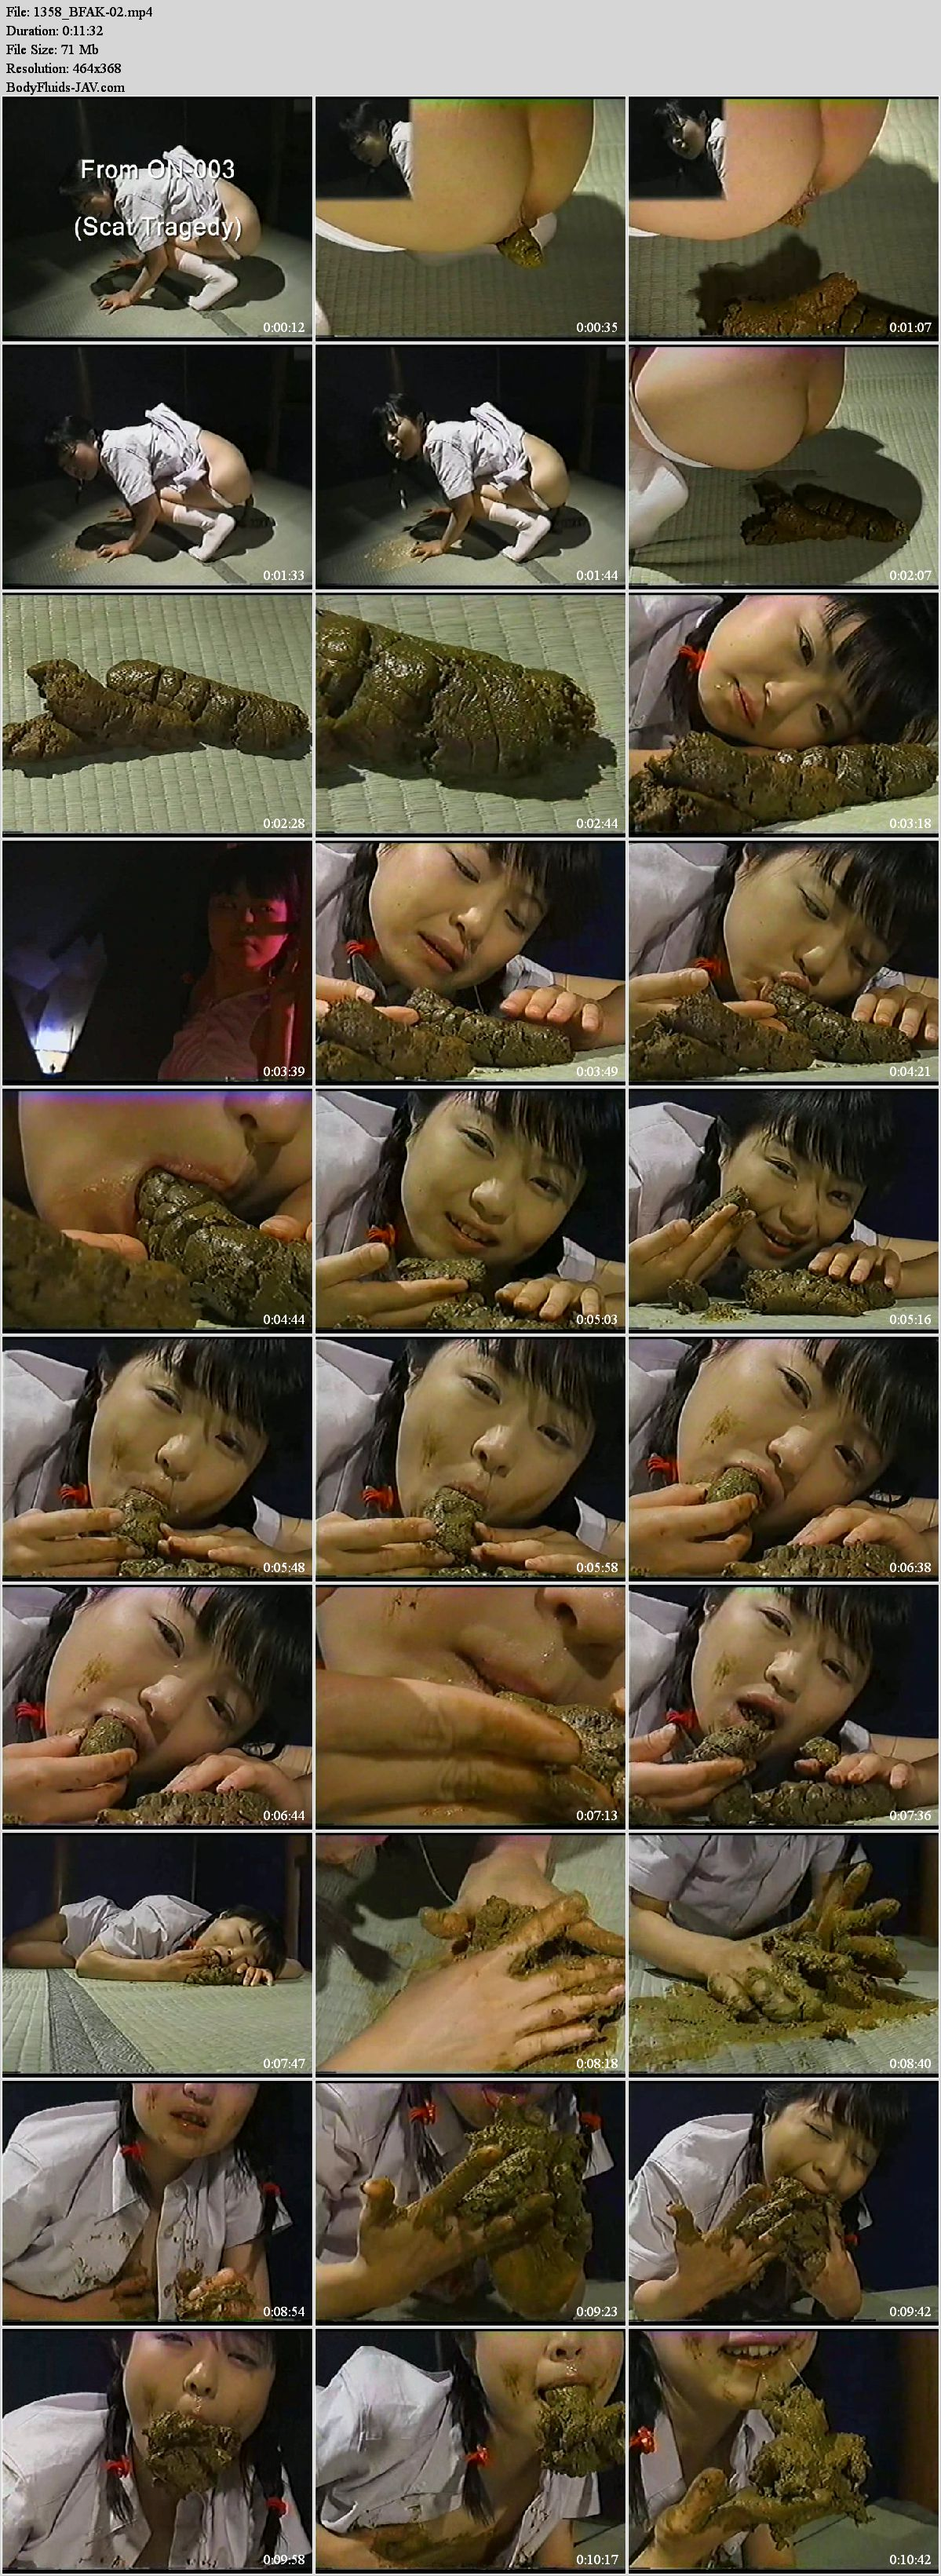 BFAK-02 Anna Kuramoto defecation and puking after eats feces.